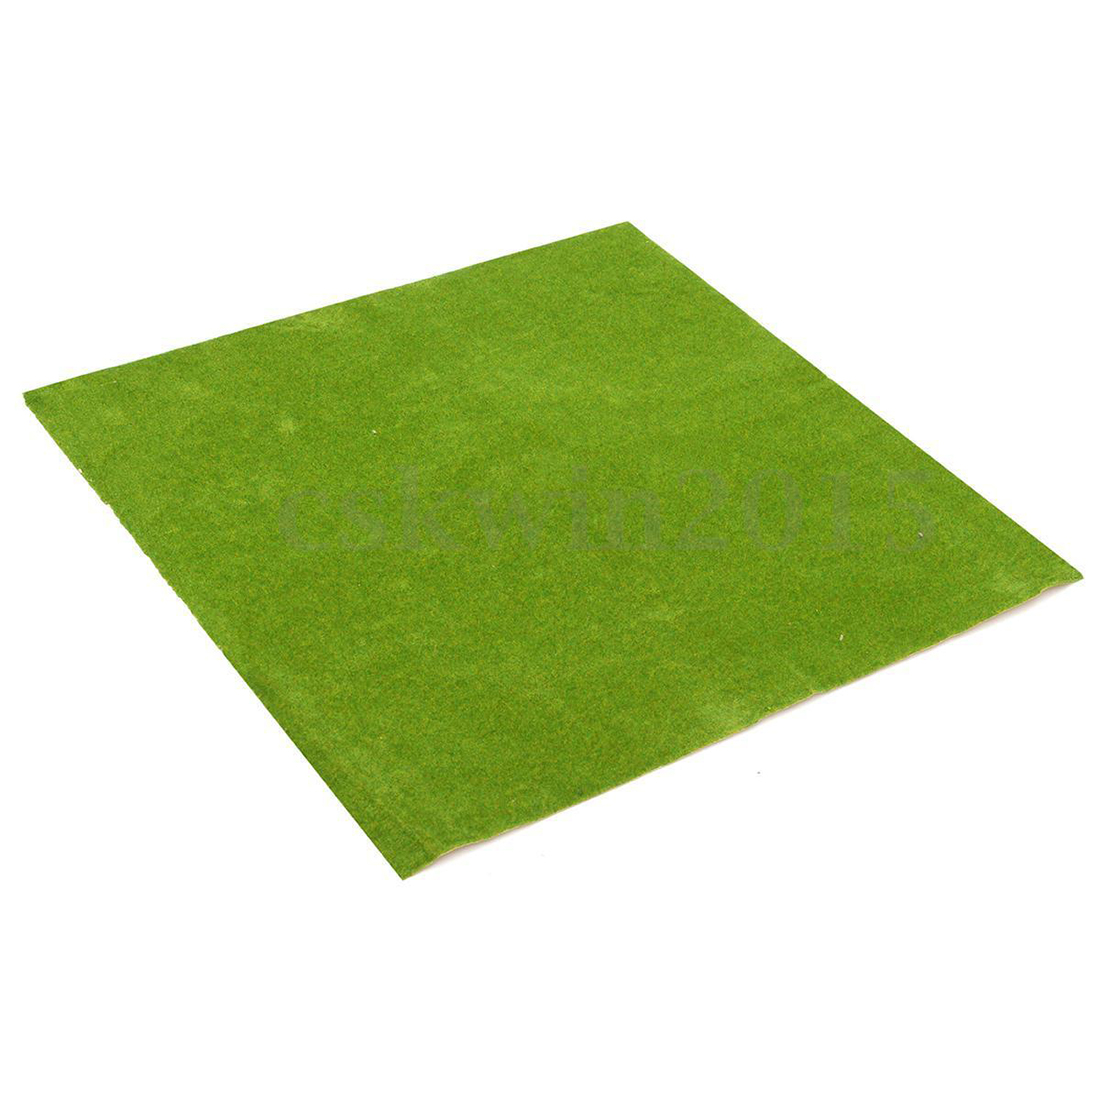 50x50cm Landscape Grass Mat Model Train Adhesive Paper Scenery Layout Lawn